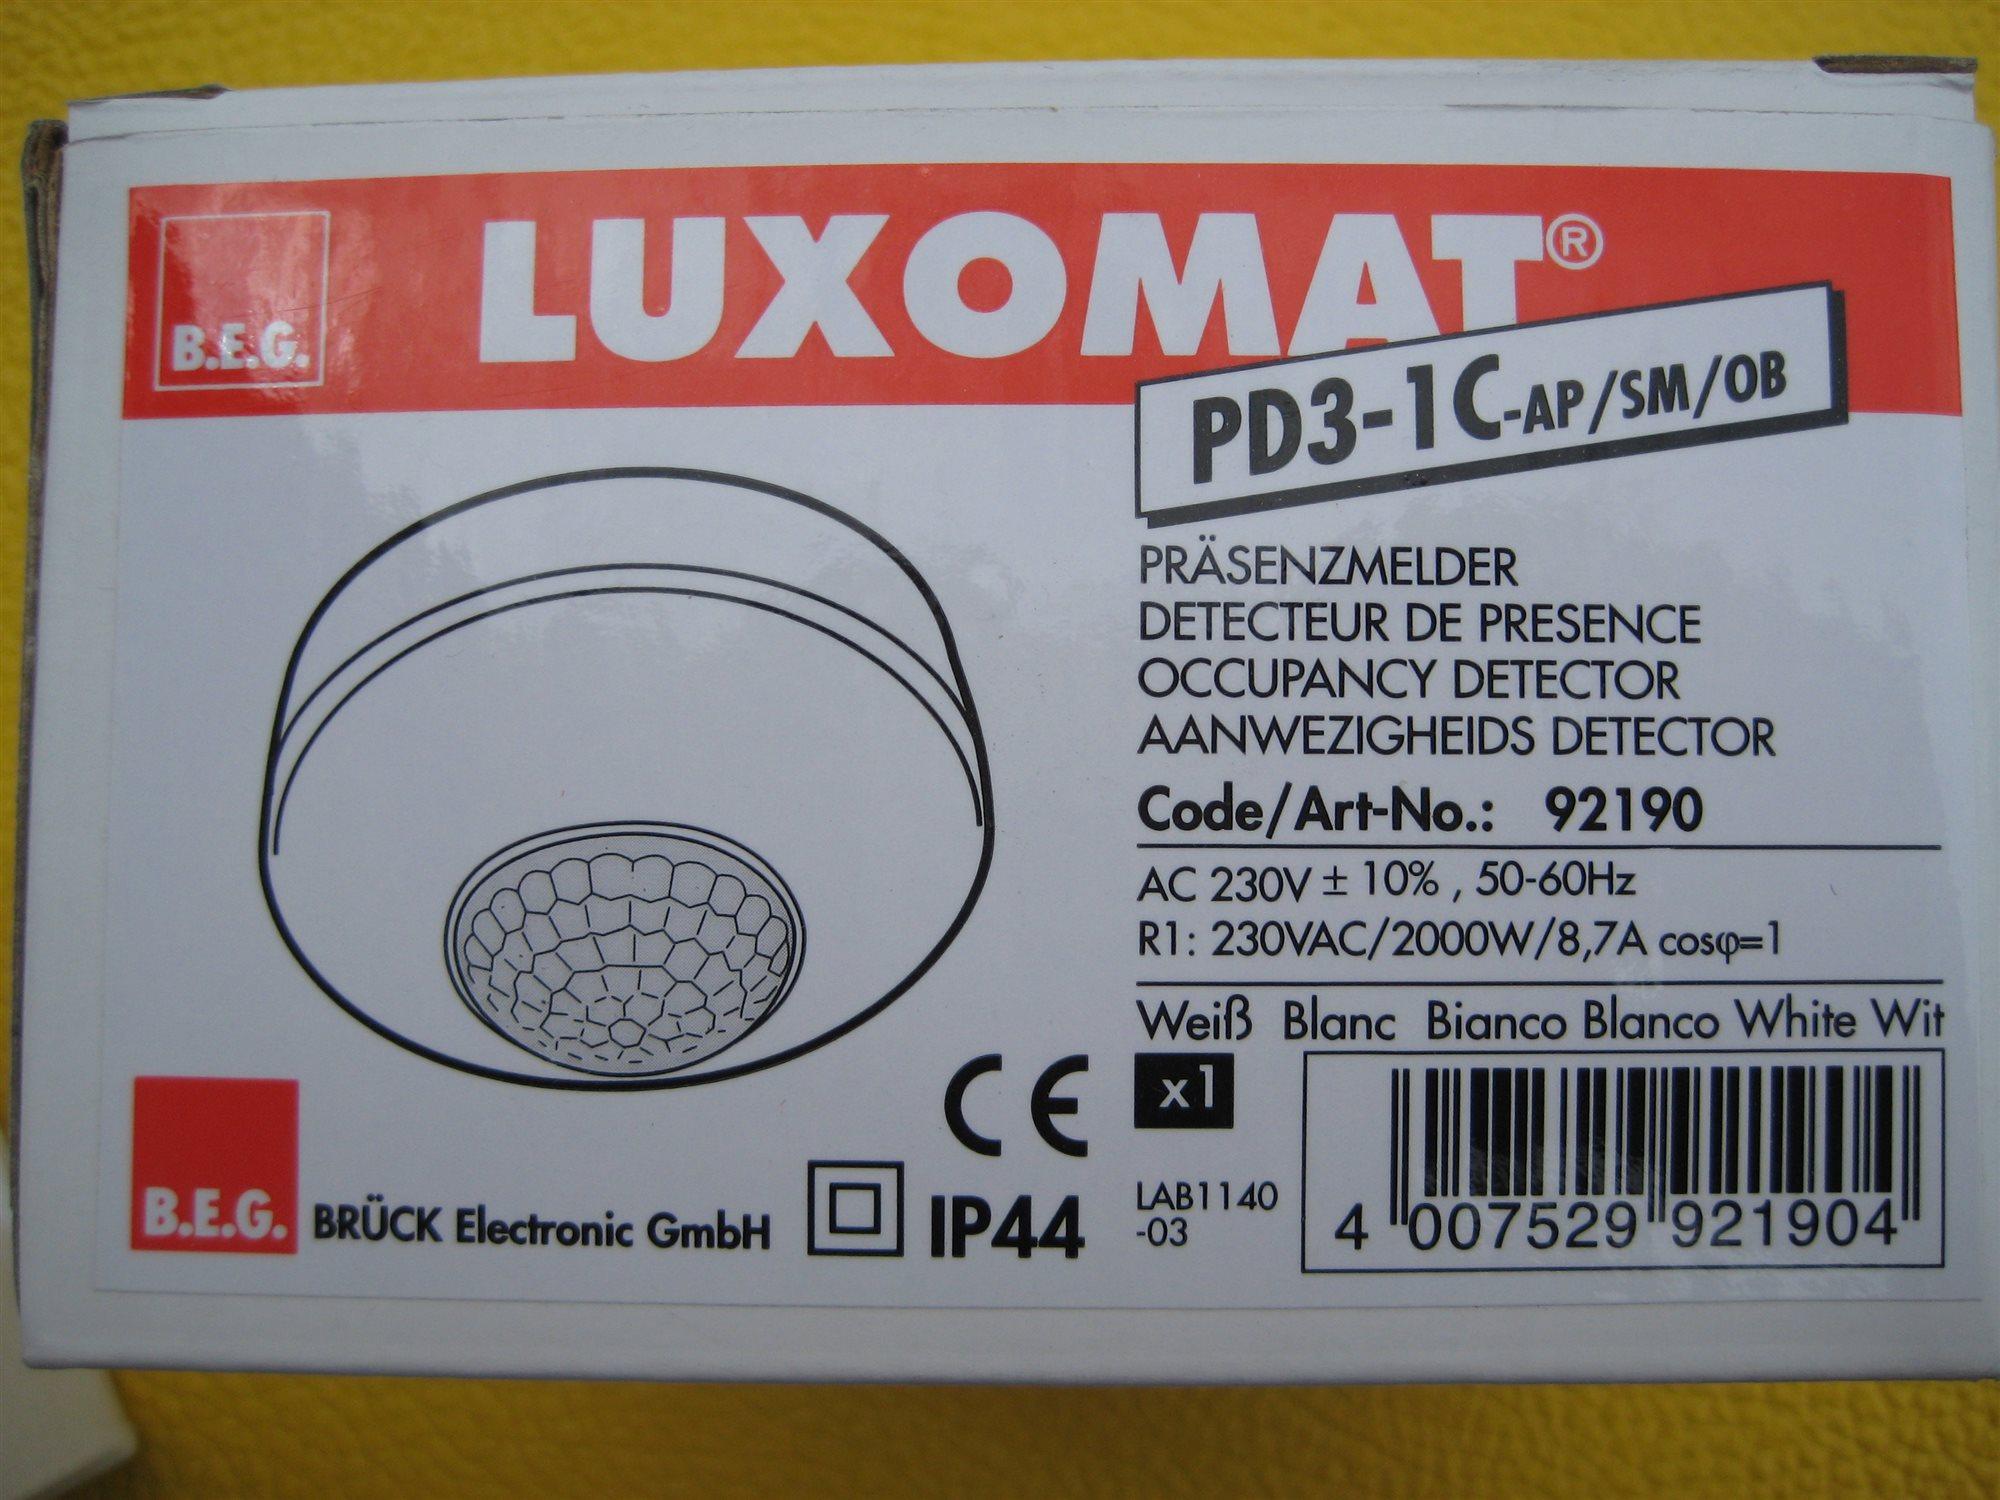 Luxomat pd3 1c